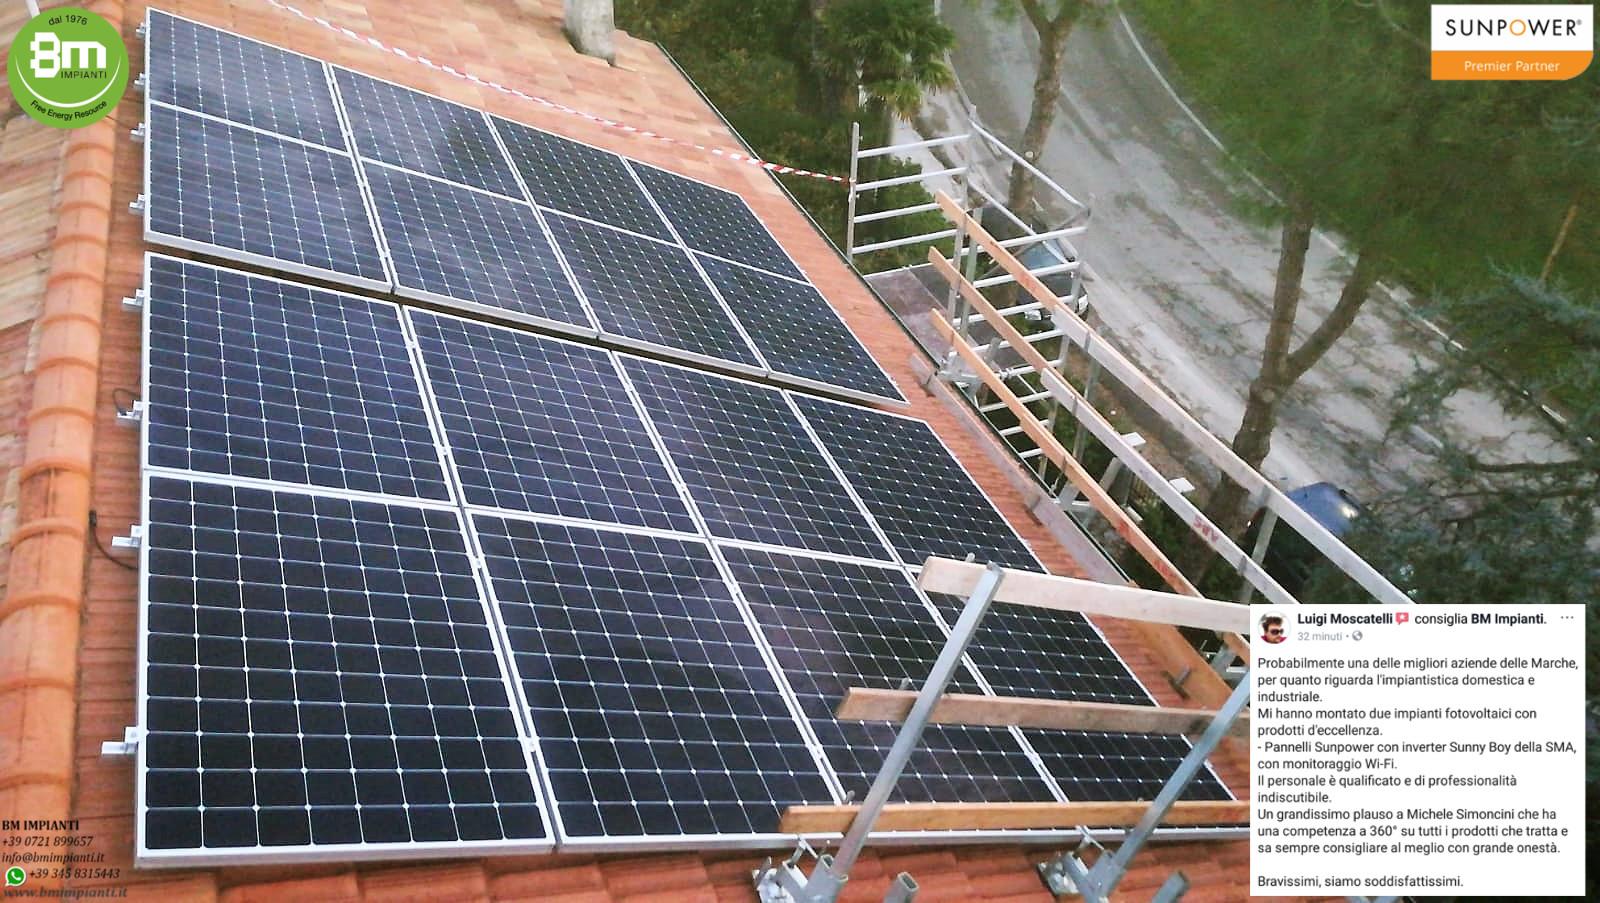 3 kWp 3kWp SunPower Moscatelli BM Impianti Mondolfo Pesaro l